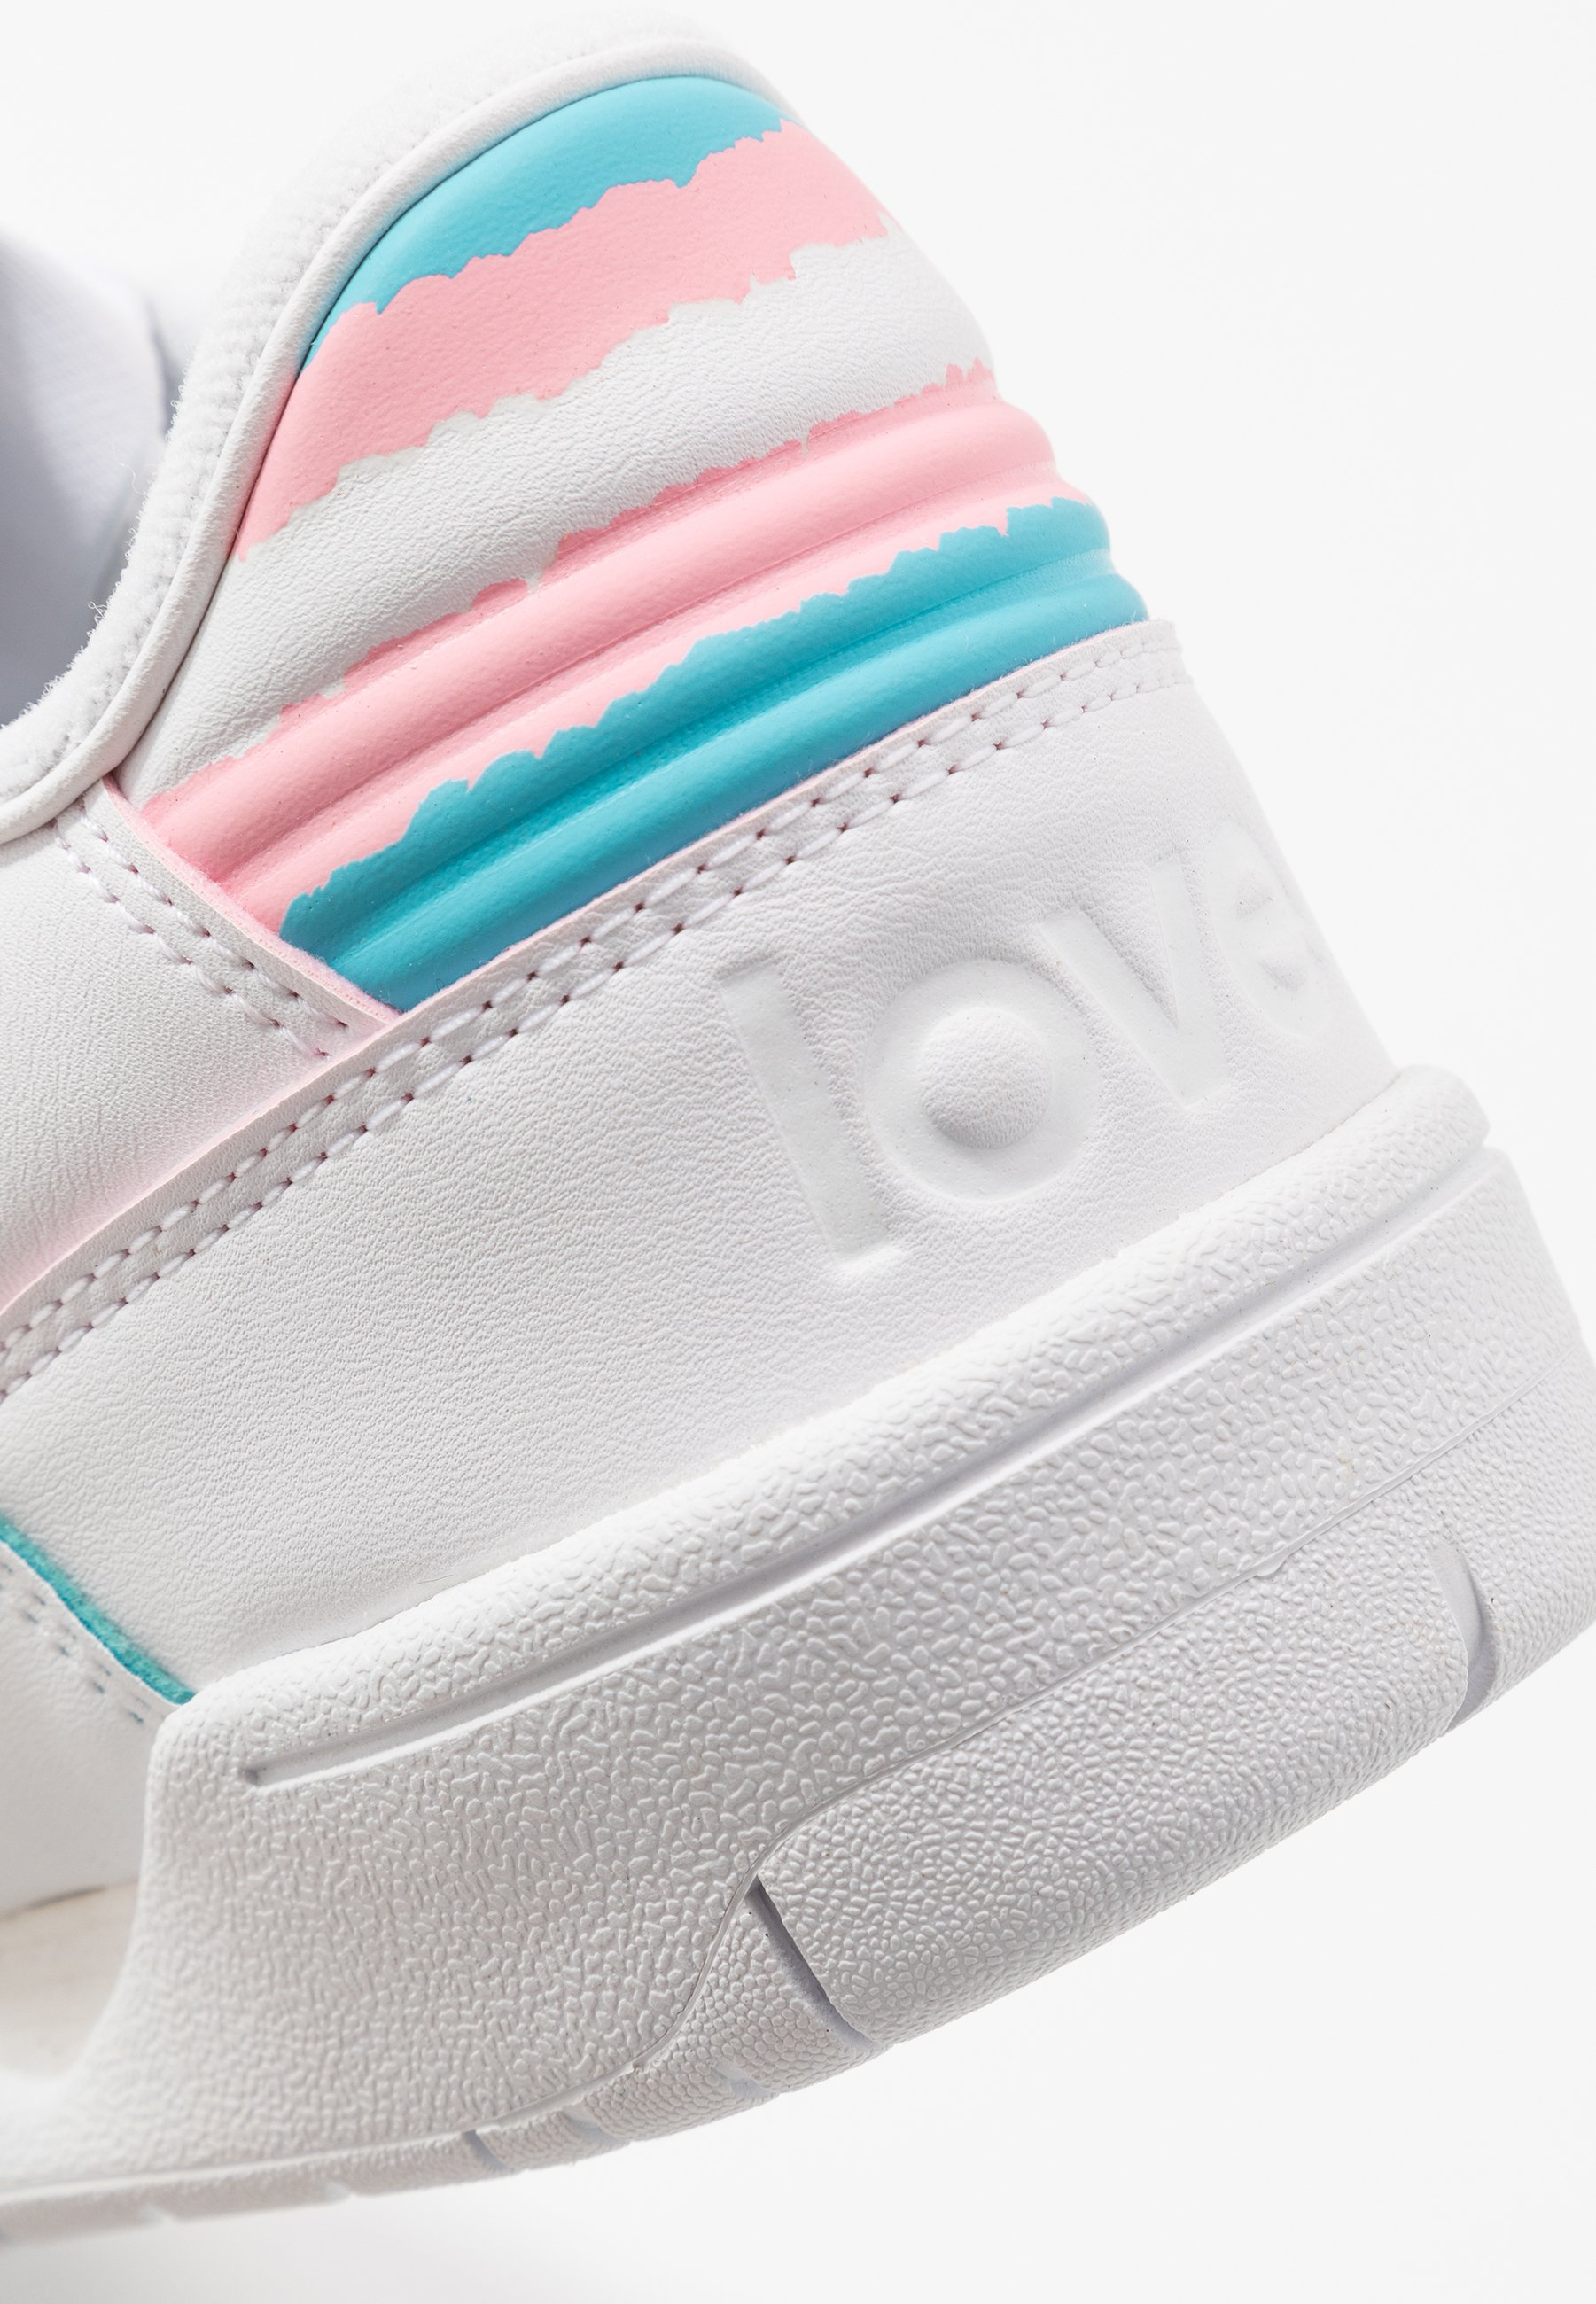 Geringster Preis adidas Originals CARERRA PRIDE - Sneaker low - footwear white/bright cyan | Damenbekleidung 2020